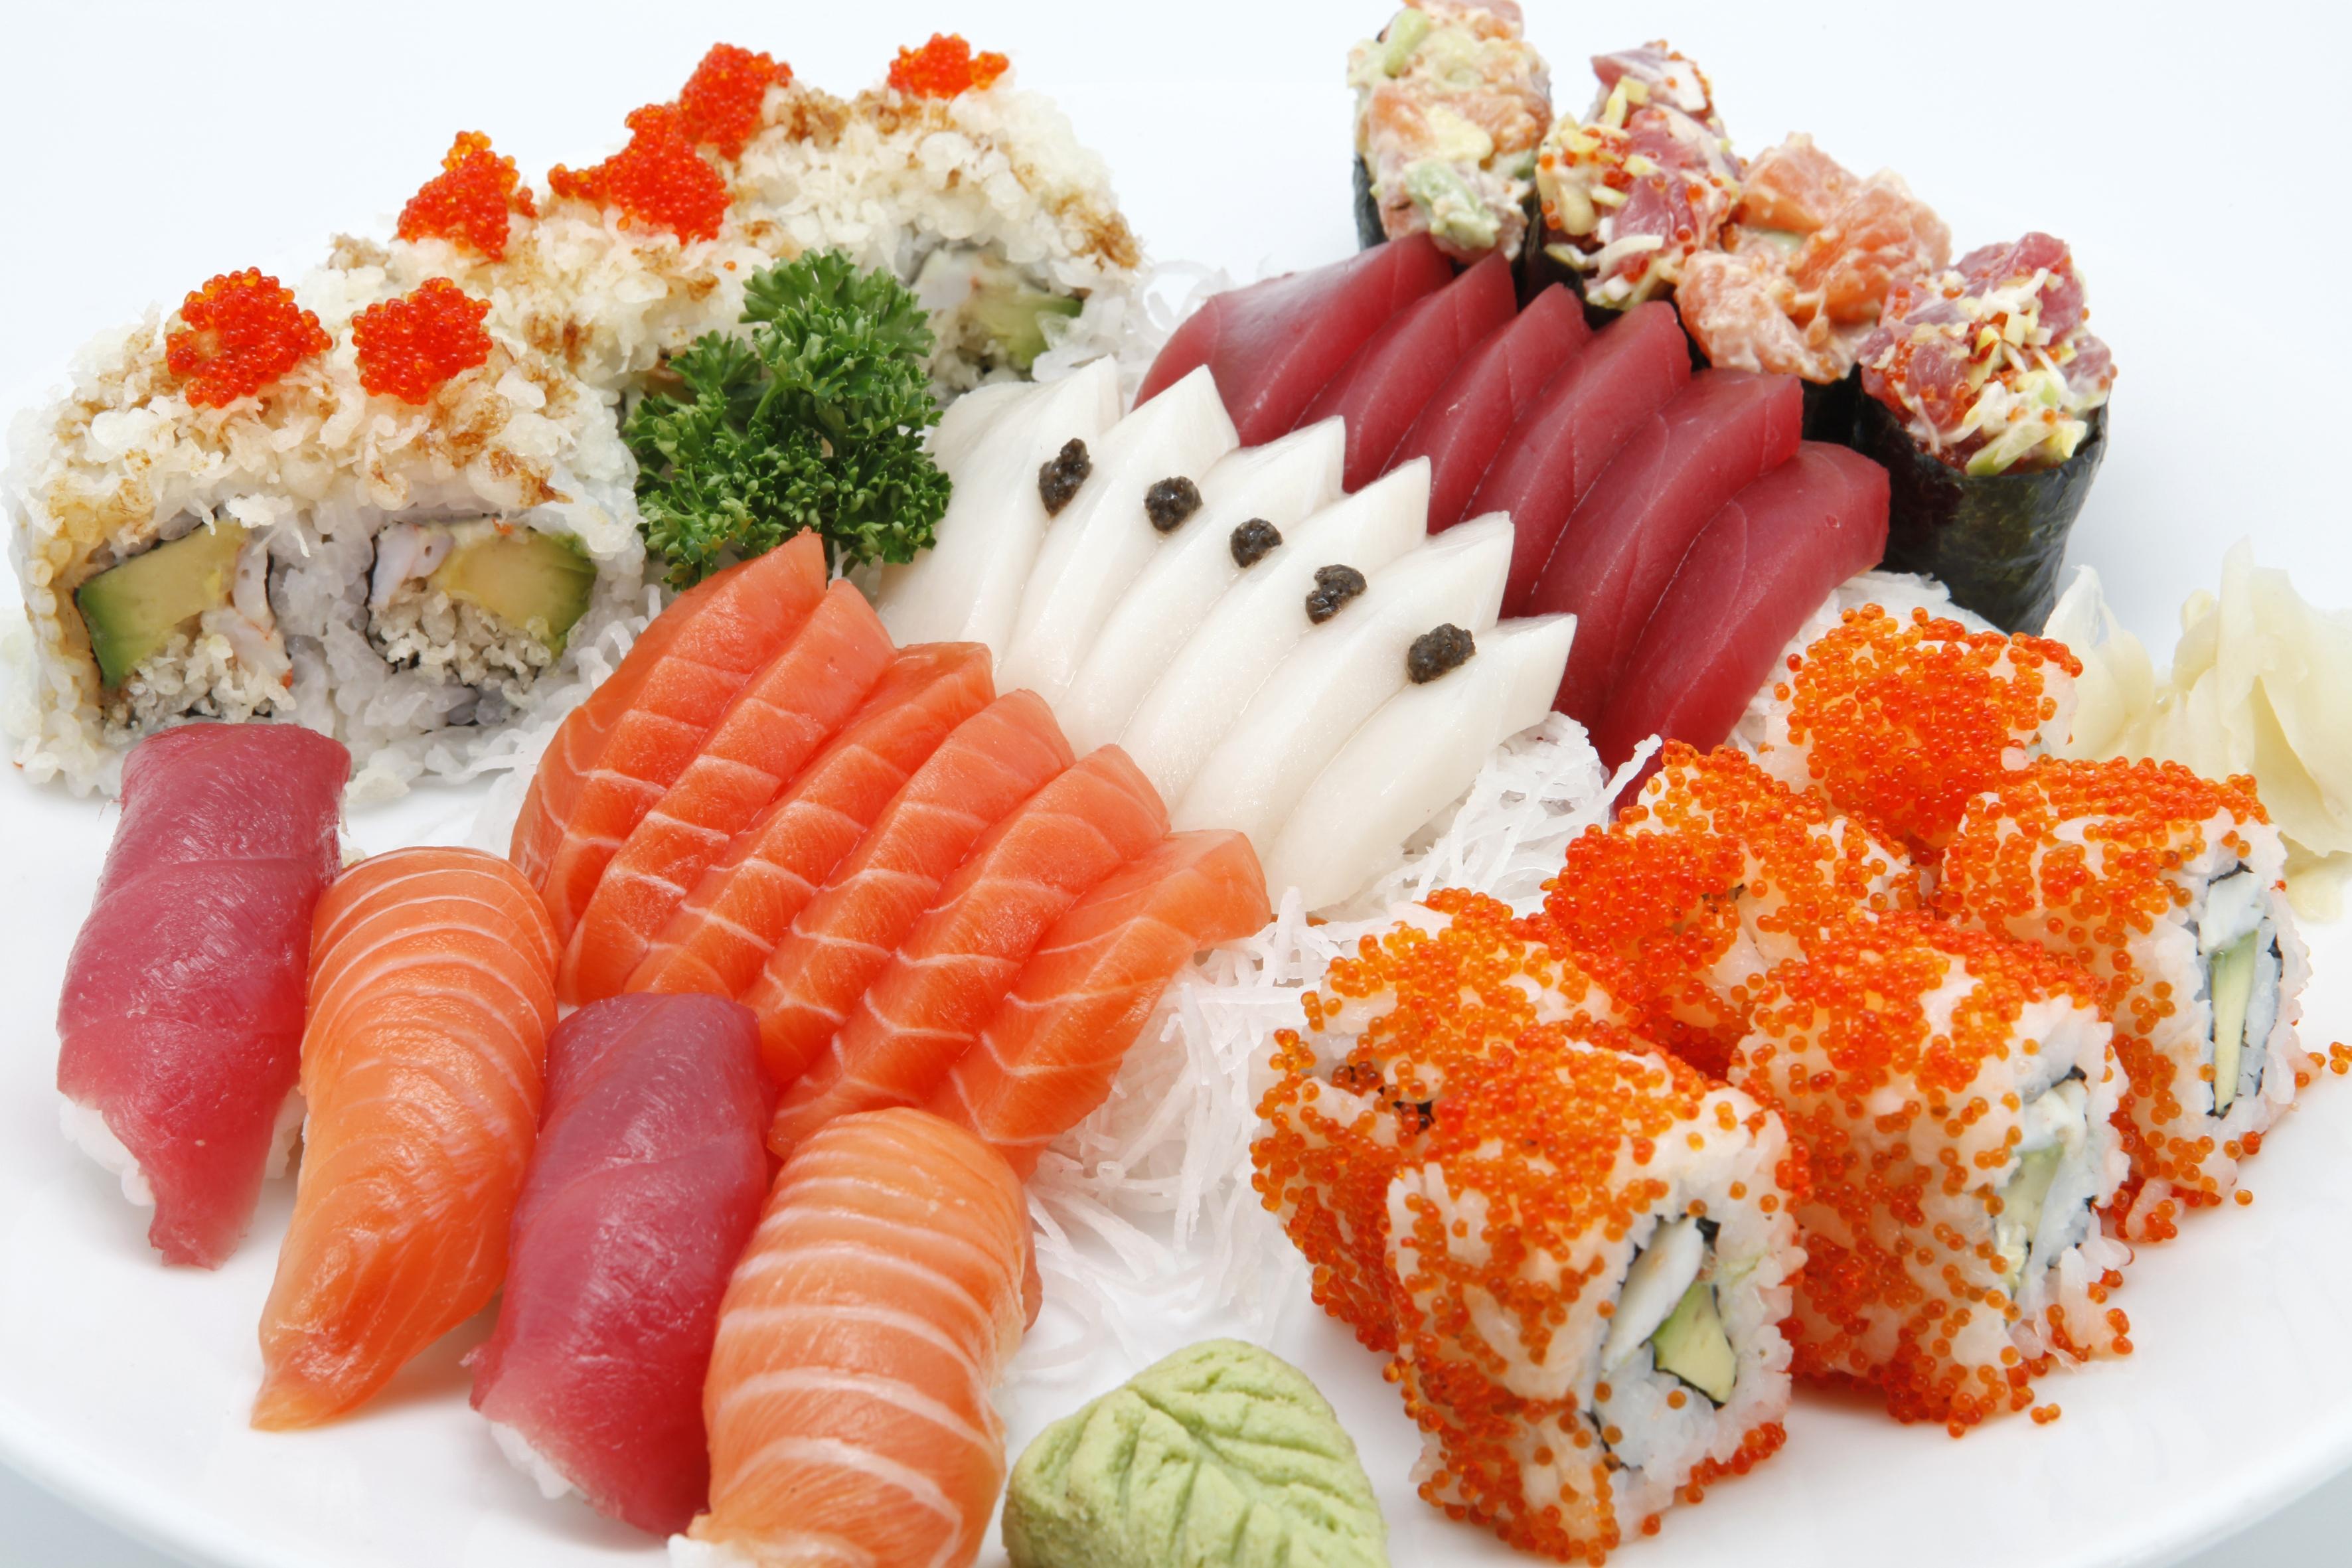 Rodzios de comida japonesa em Goinia  Goinia